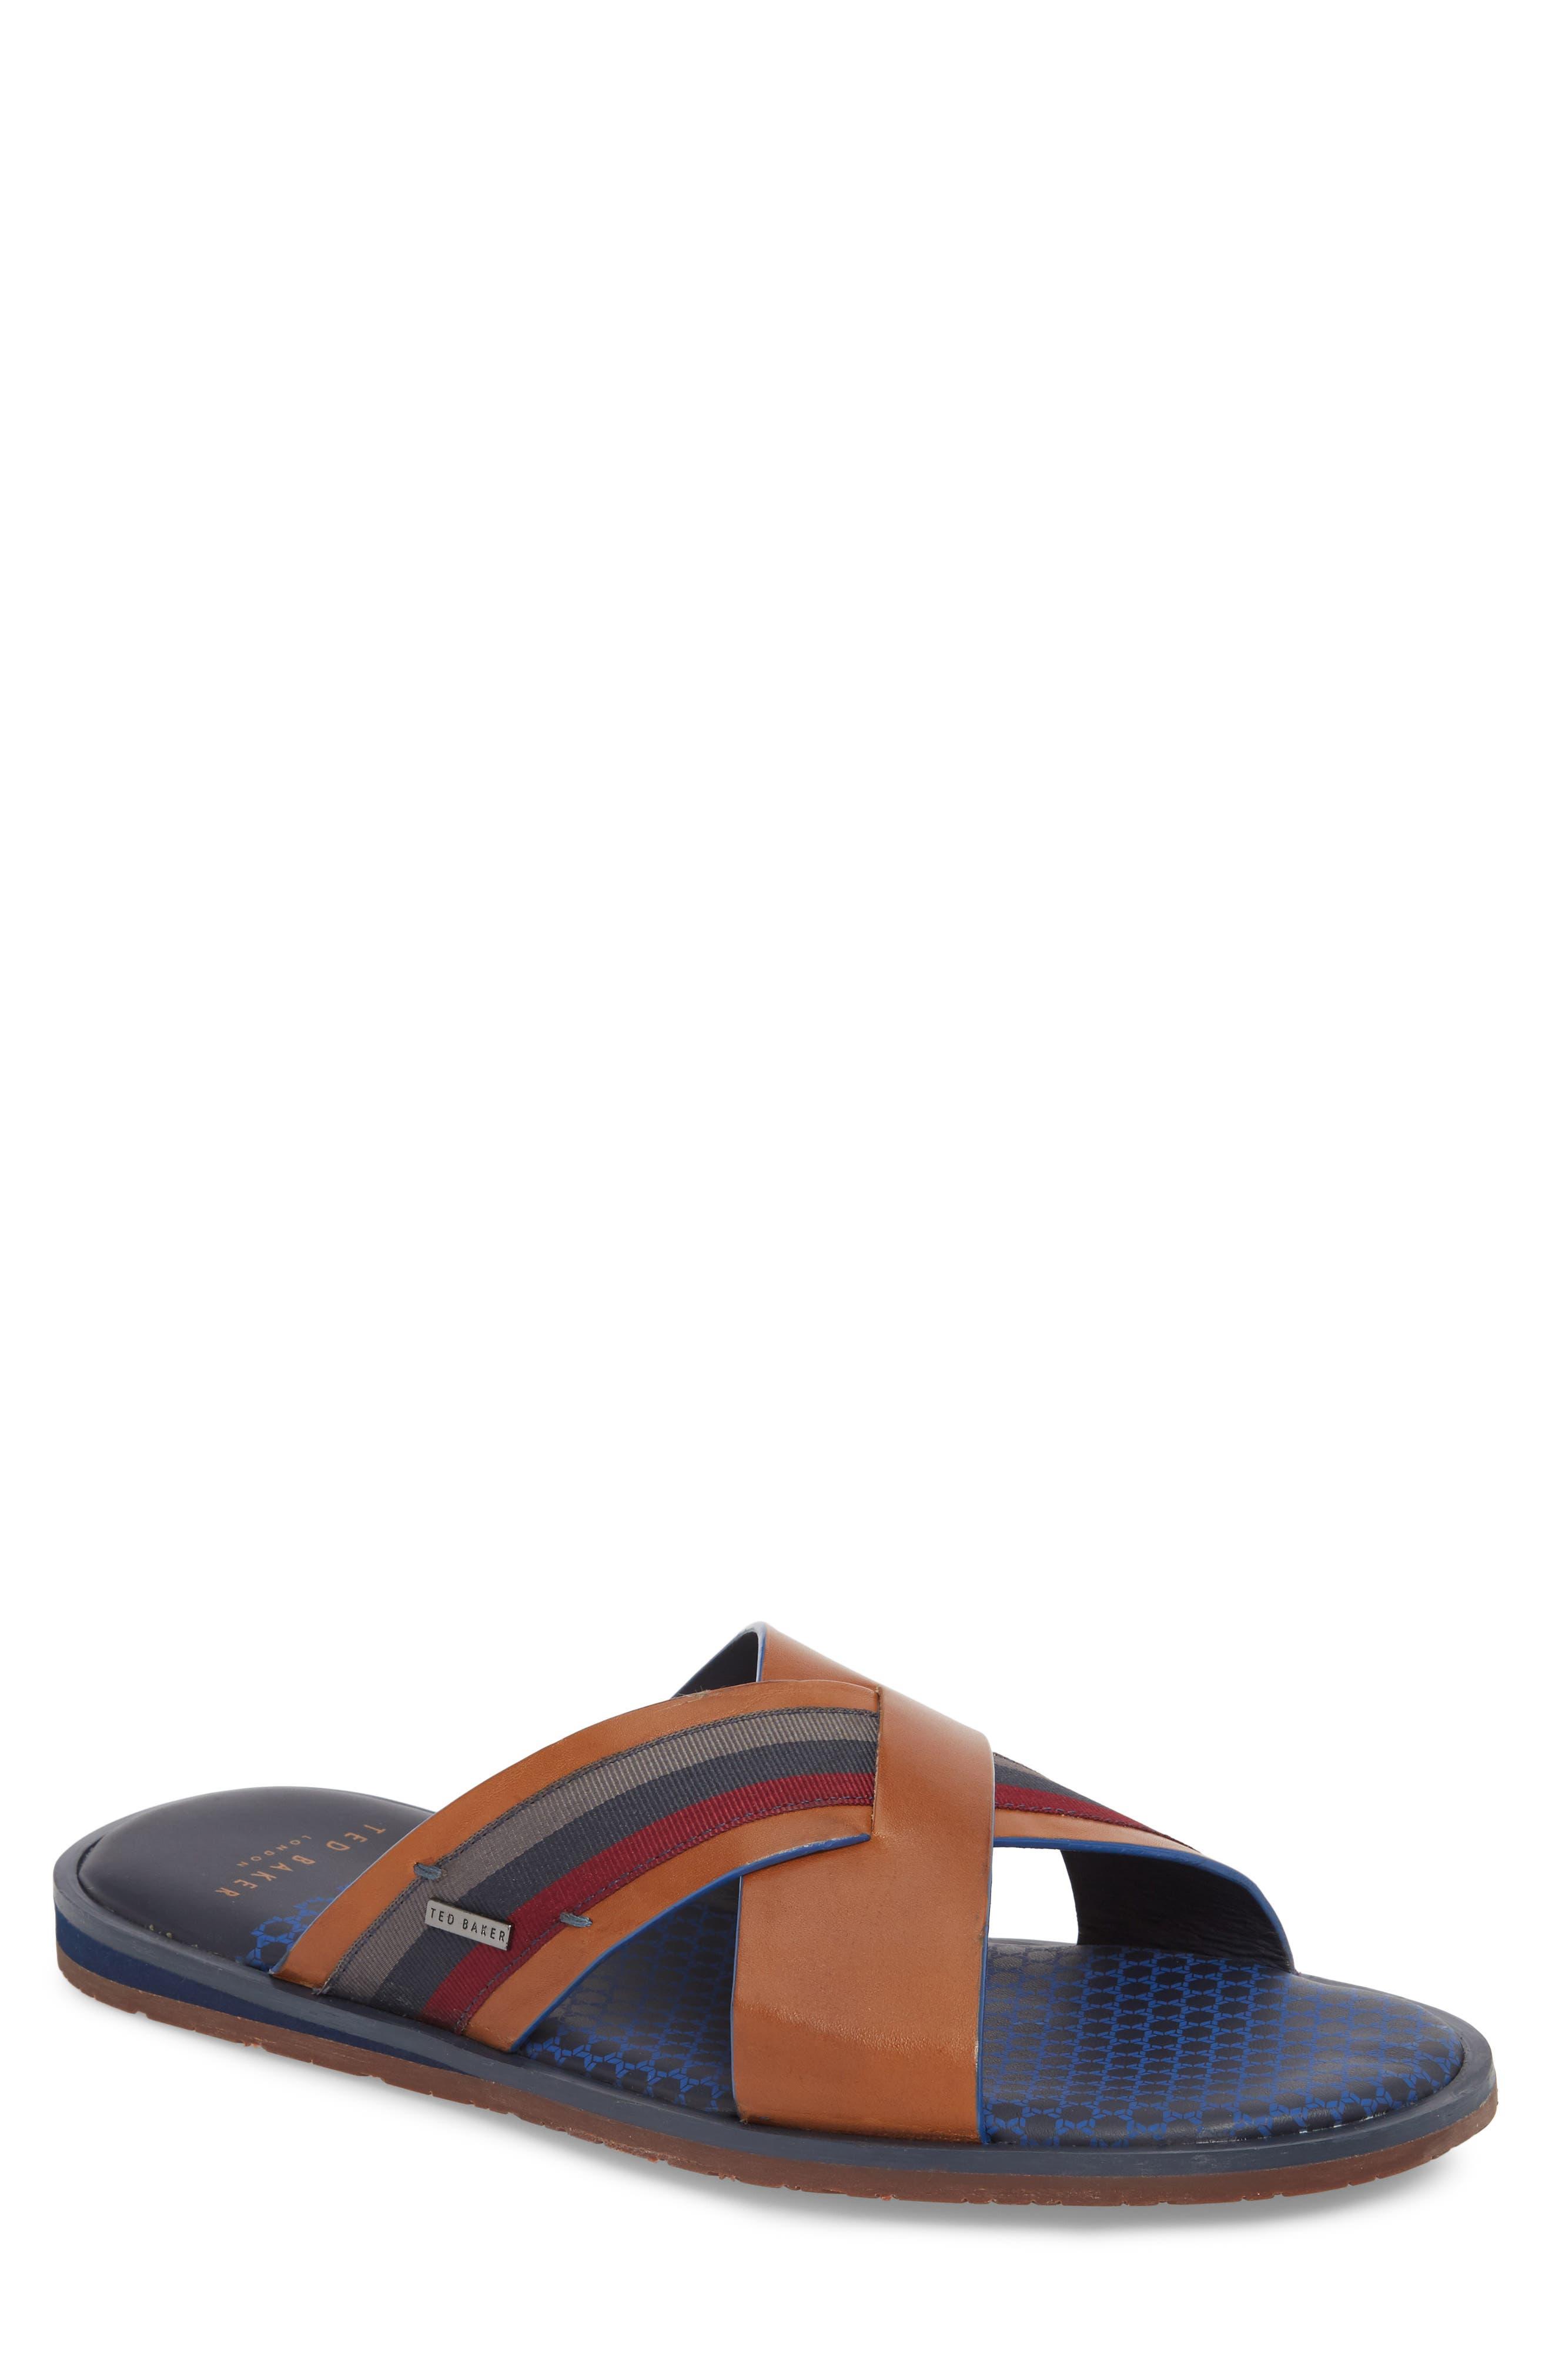 Farrull Cross Strap Slide Sandal,                         Main,                         color, Tan Leather/ Textile